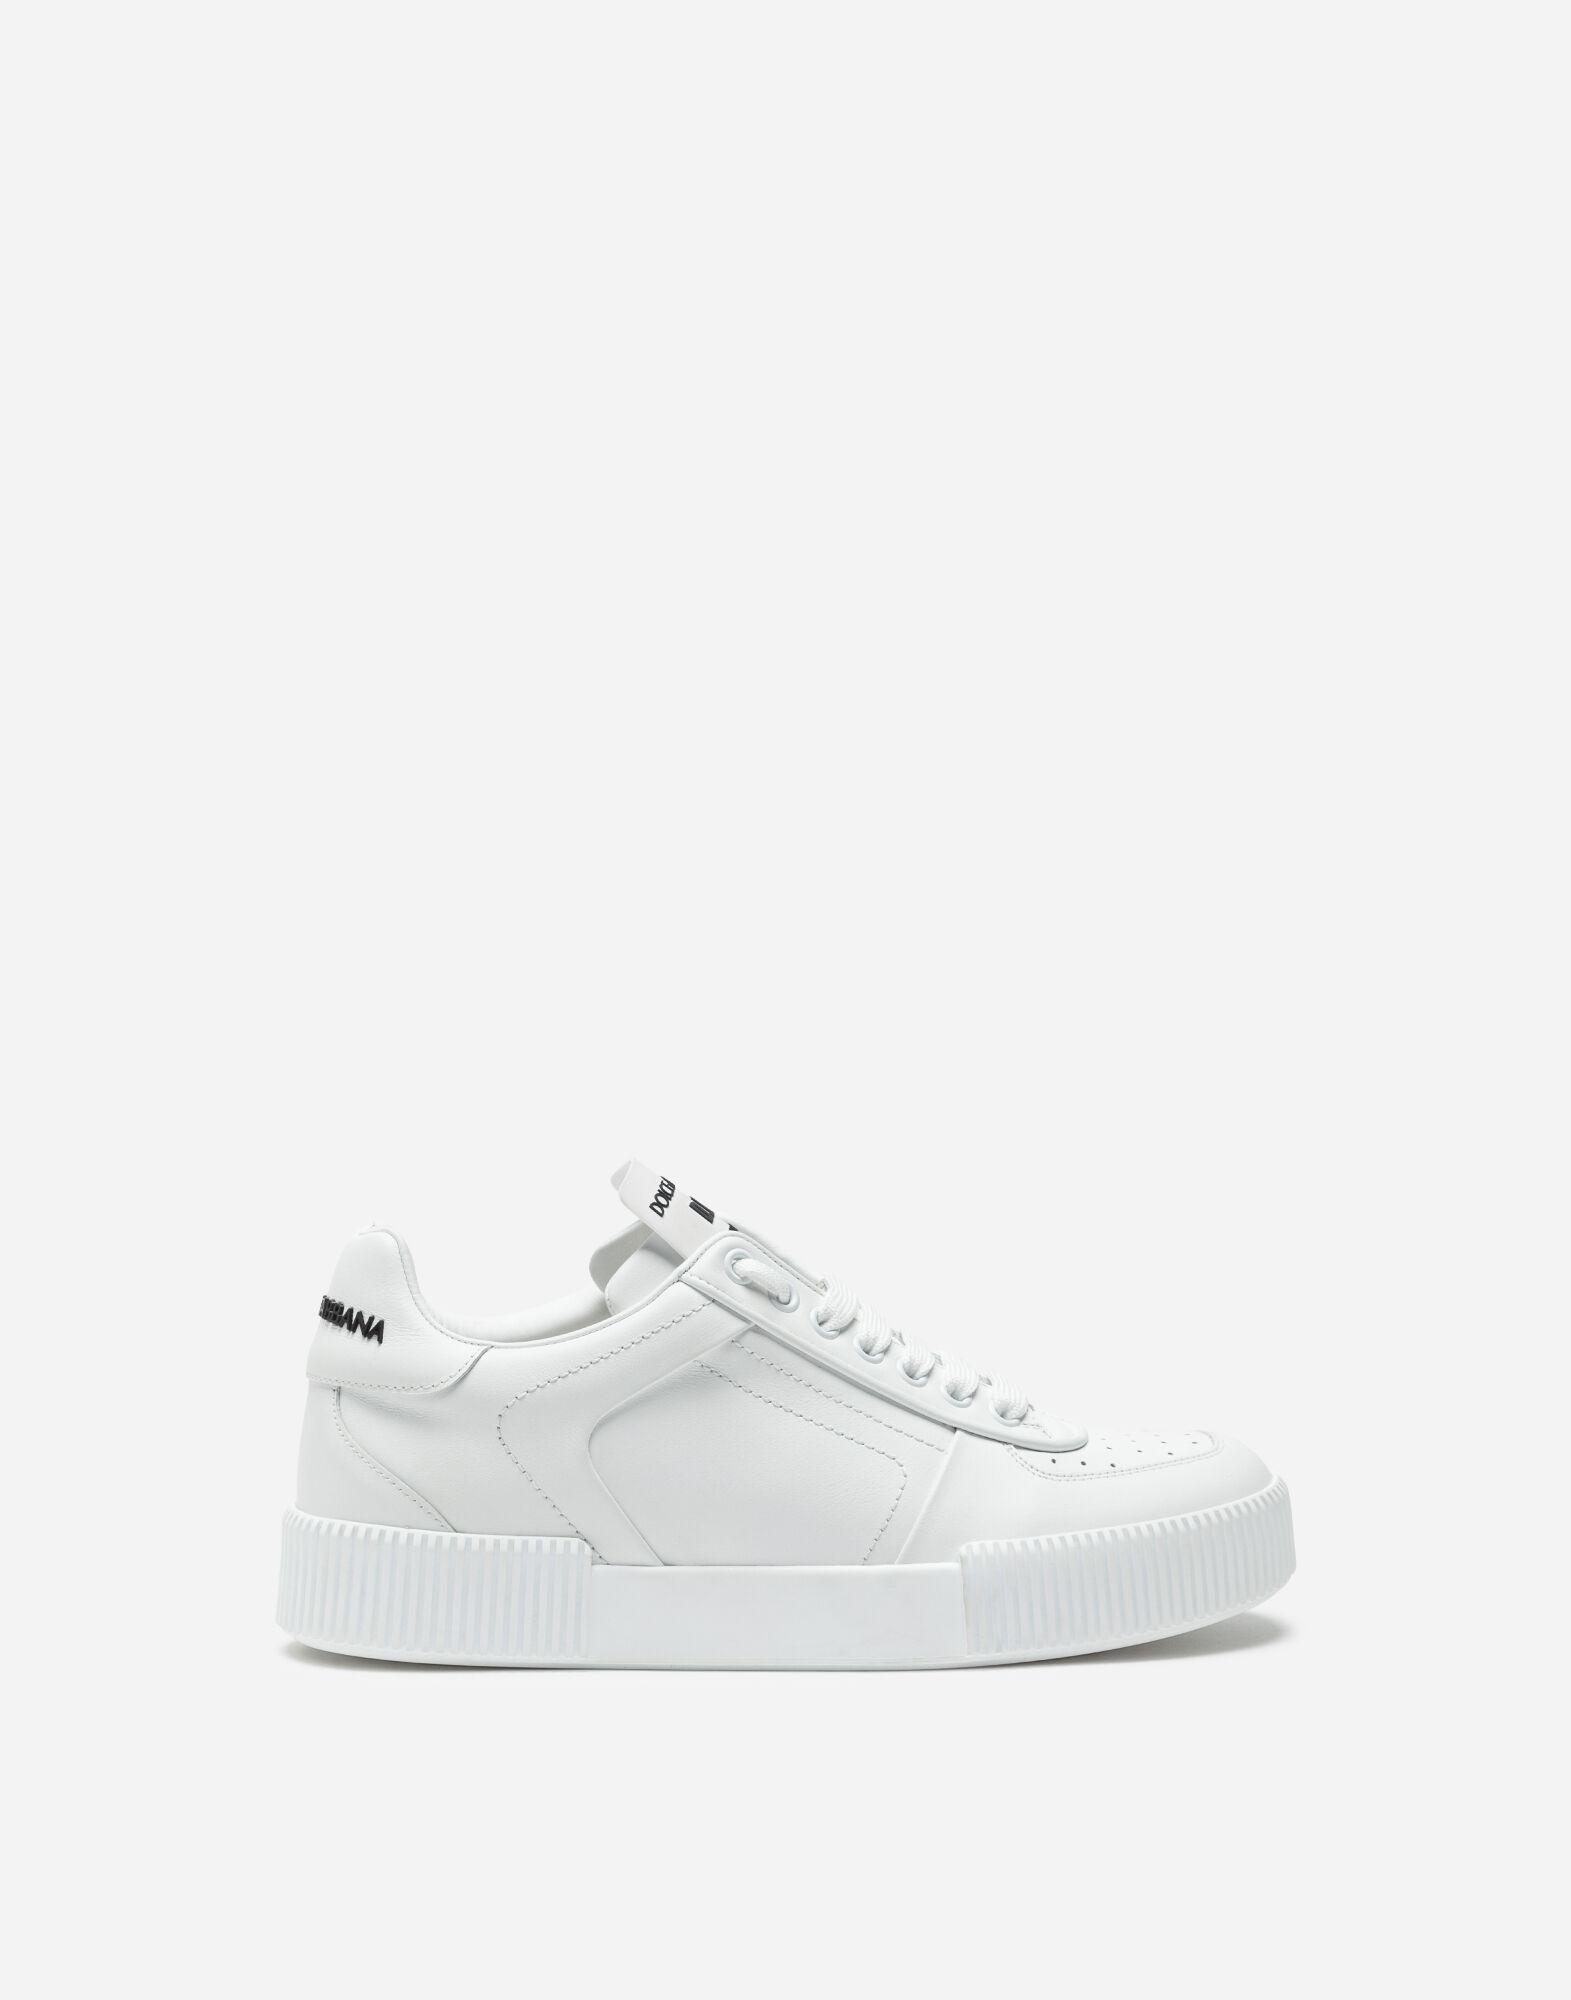 amp;gabbana amp;gabbana amp;gabbana Sneakers FemmeDolce Pour Pour FemmeDolce Sneakers Pour Sneakers FemmeDolce Pour Sneakers FemmeDolce qzSMVUp